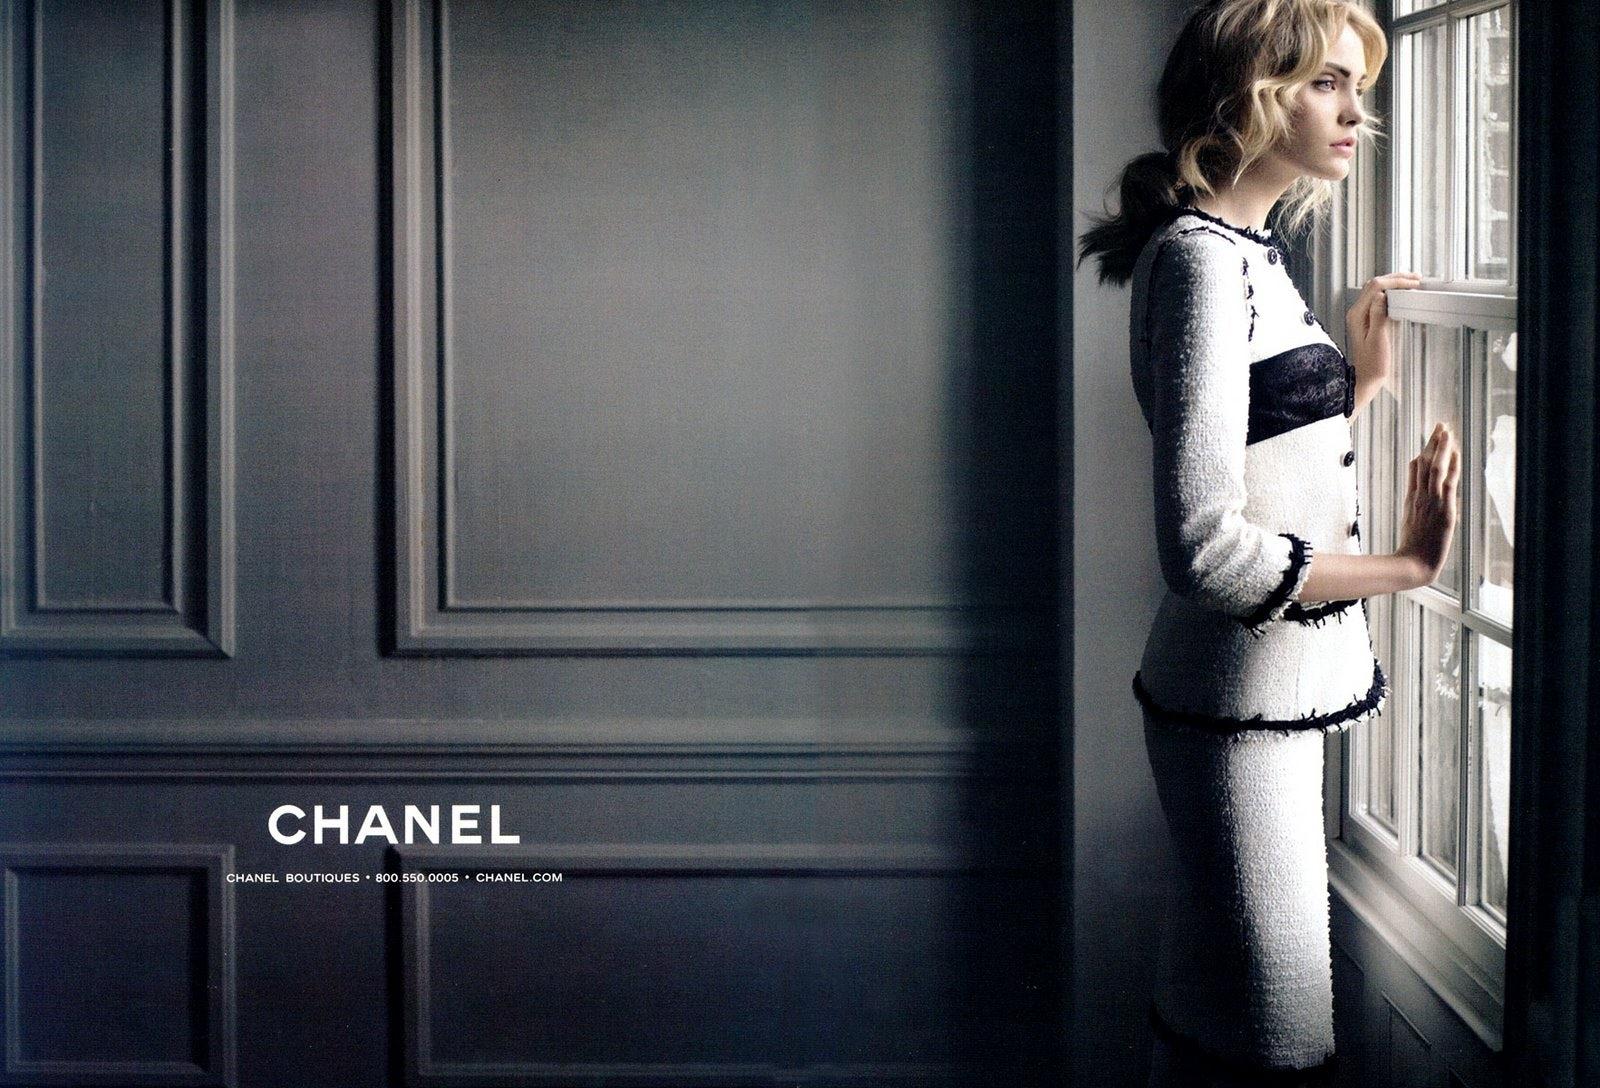 ChanelPic-Model-2013